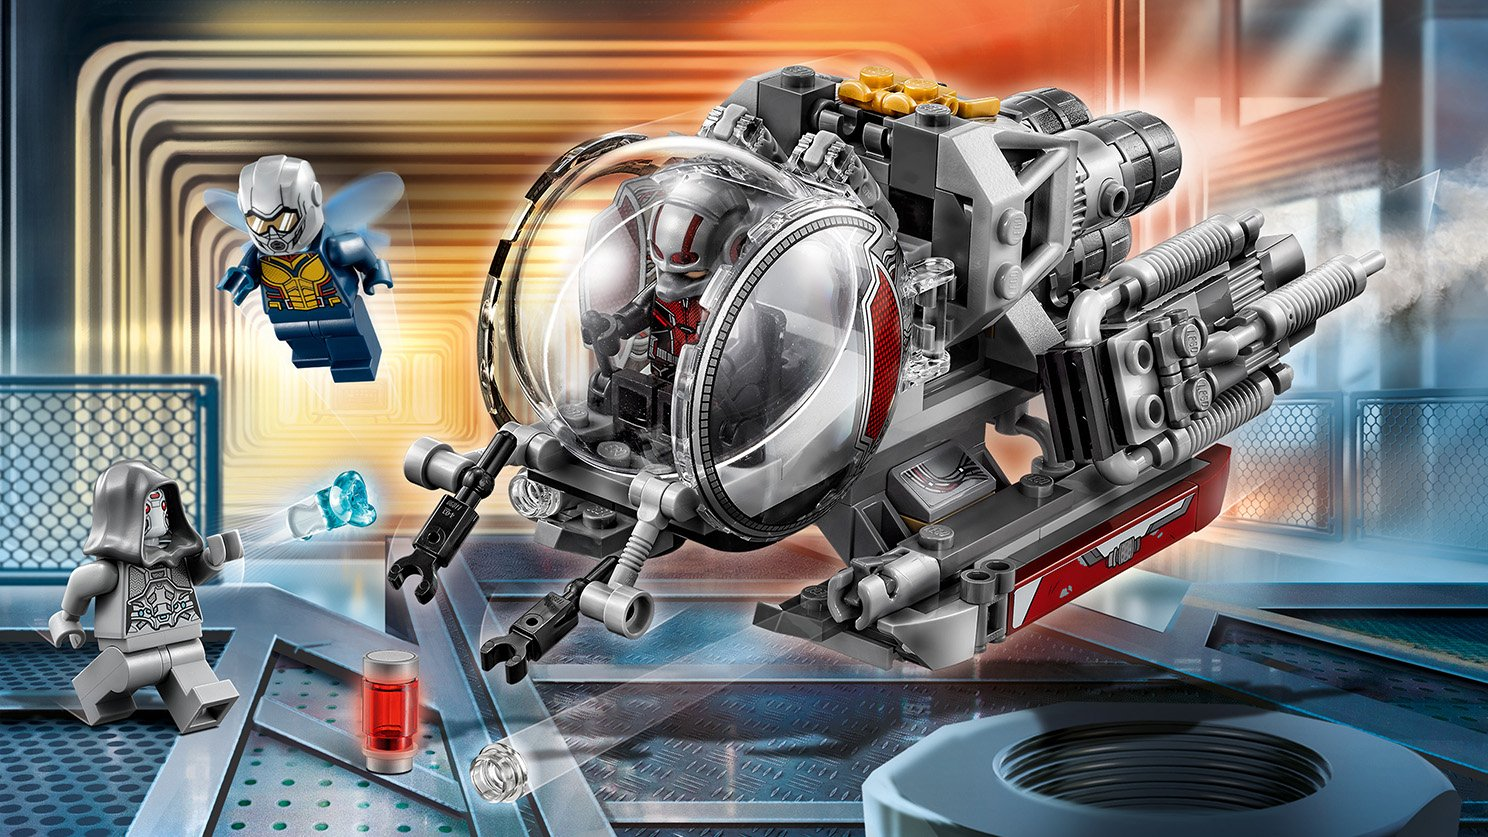 LEGO Marvel Super Heroes Badacze kwantowej krainy